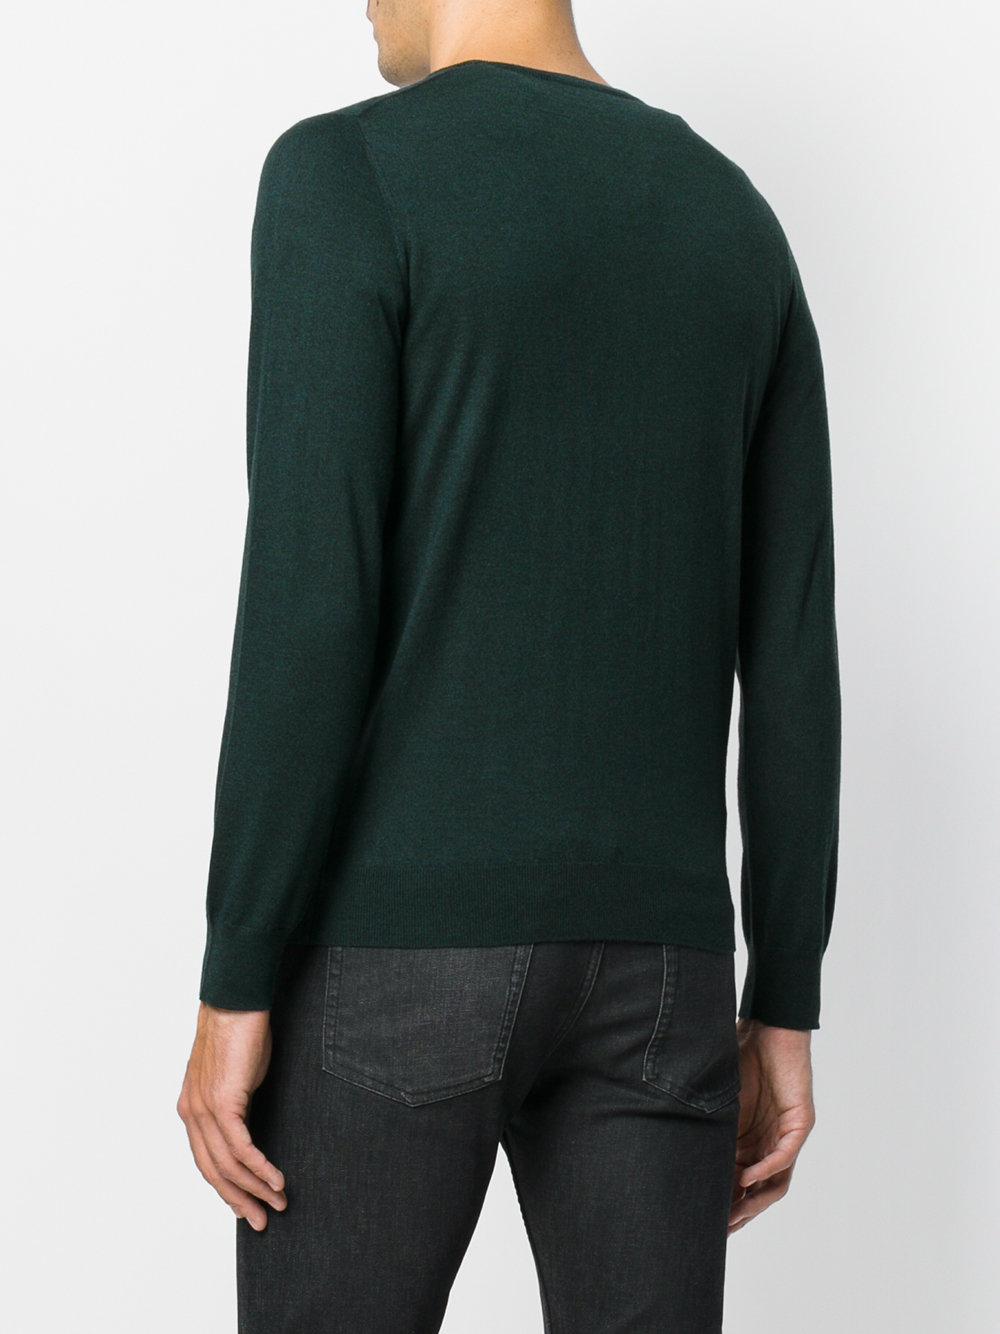 Laneus Silk Crew Neck Sweater in Green for Men